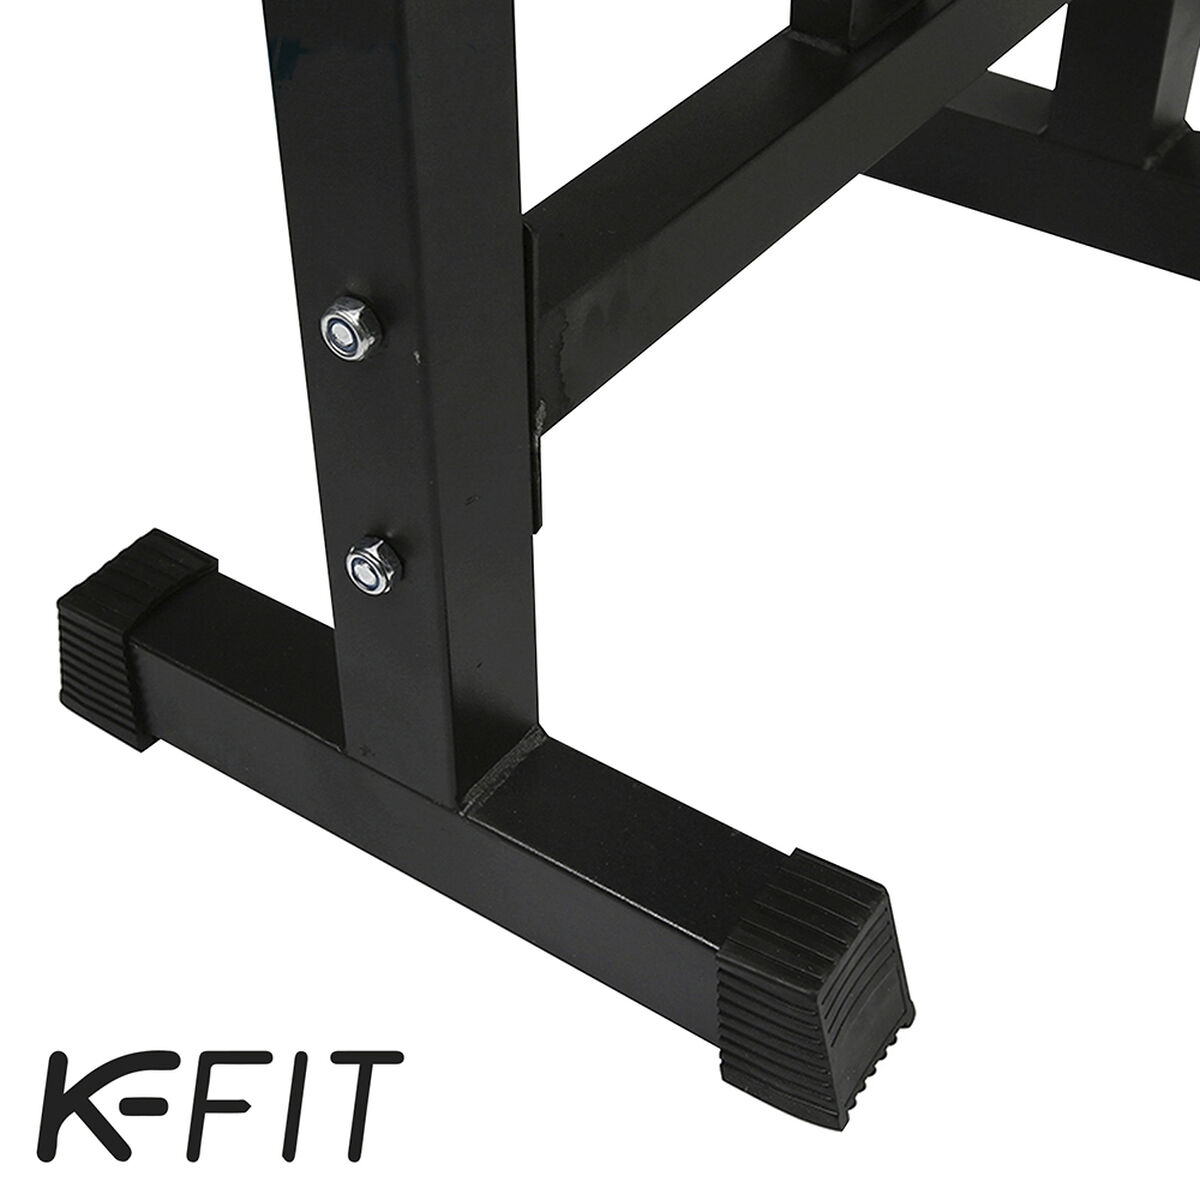 Banca Multifuncional K-FIT